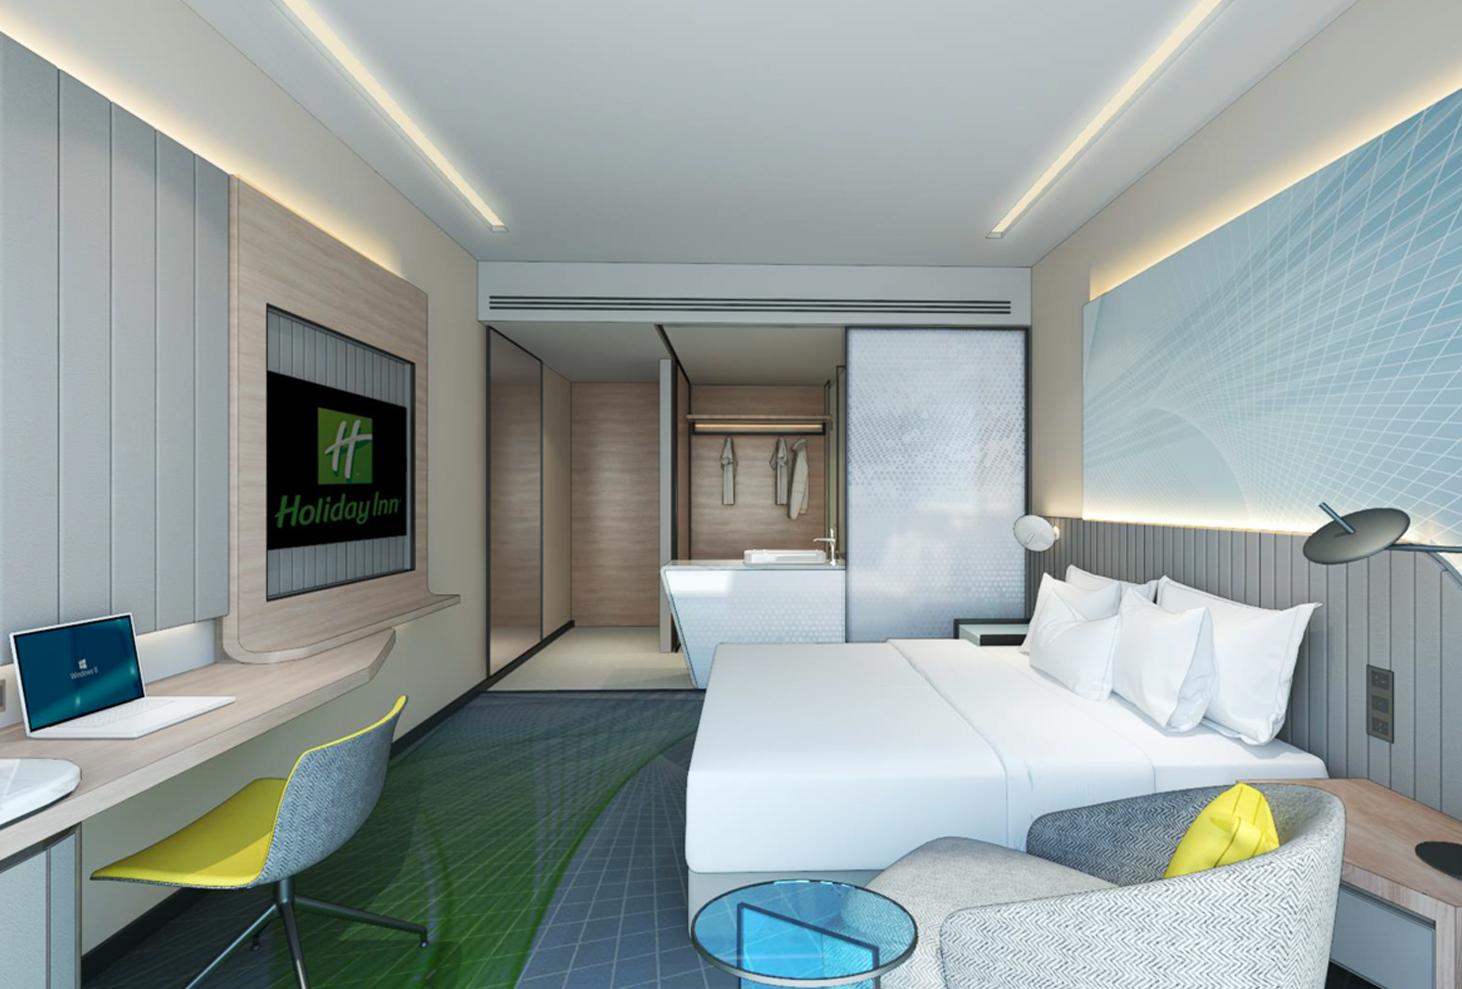 Holiday Inn hotel room located in Alfa Bangsar